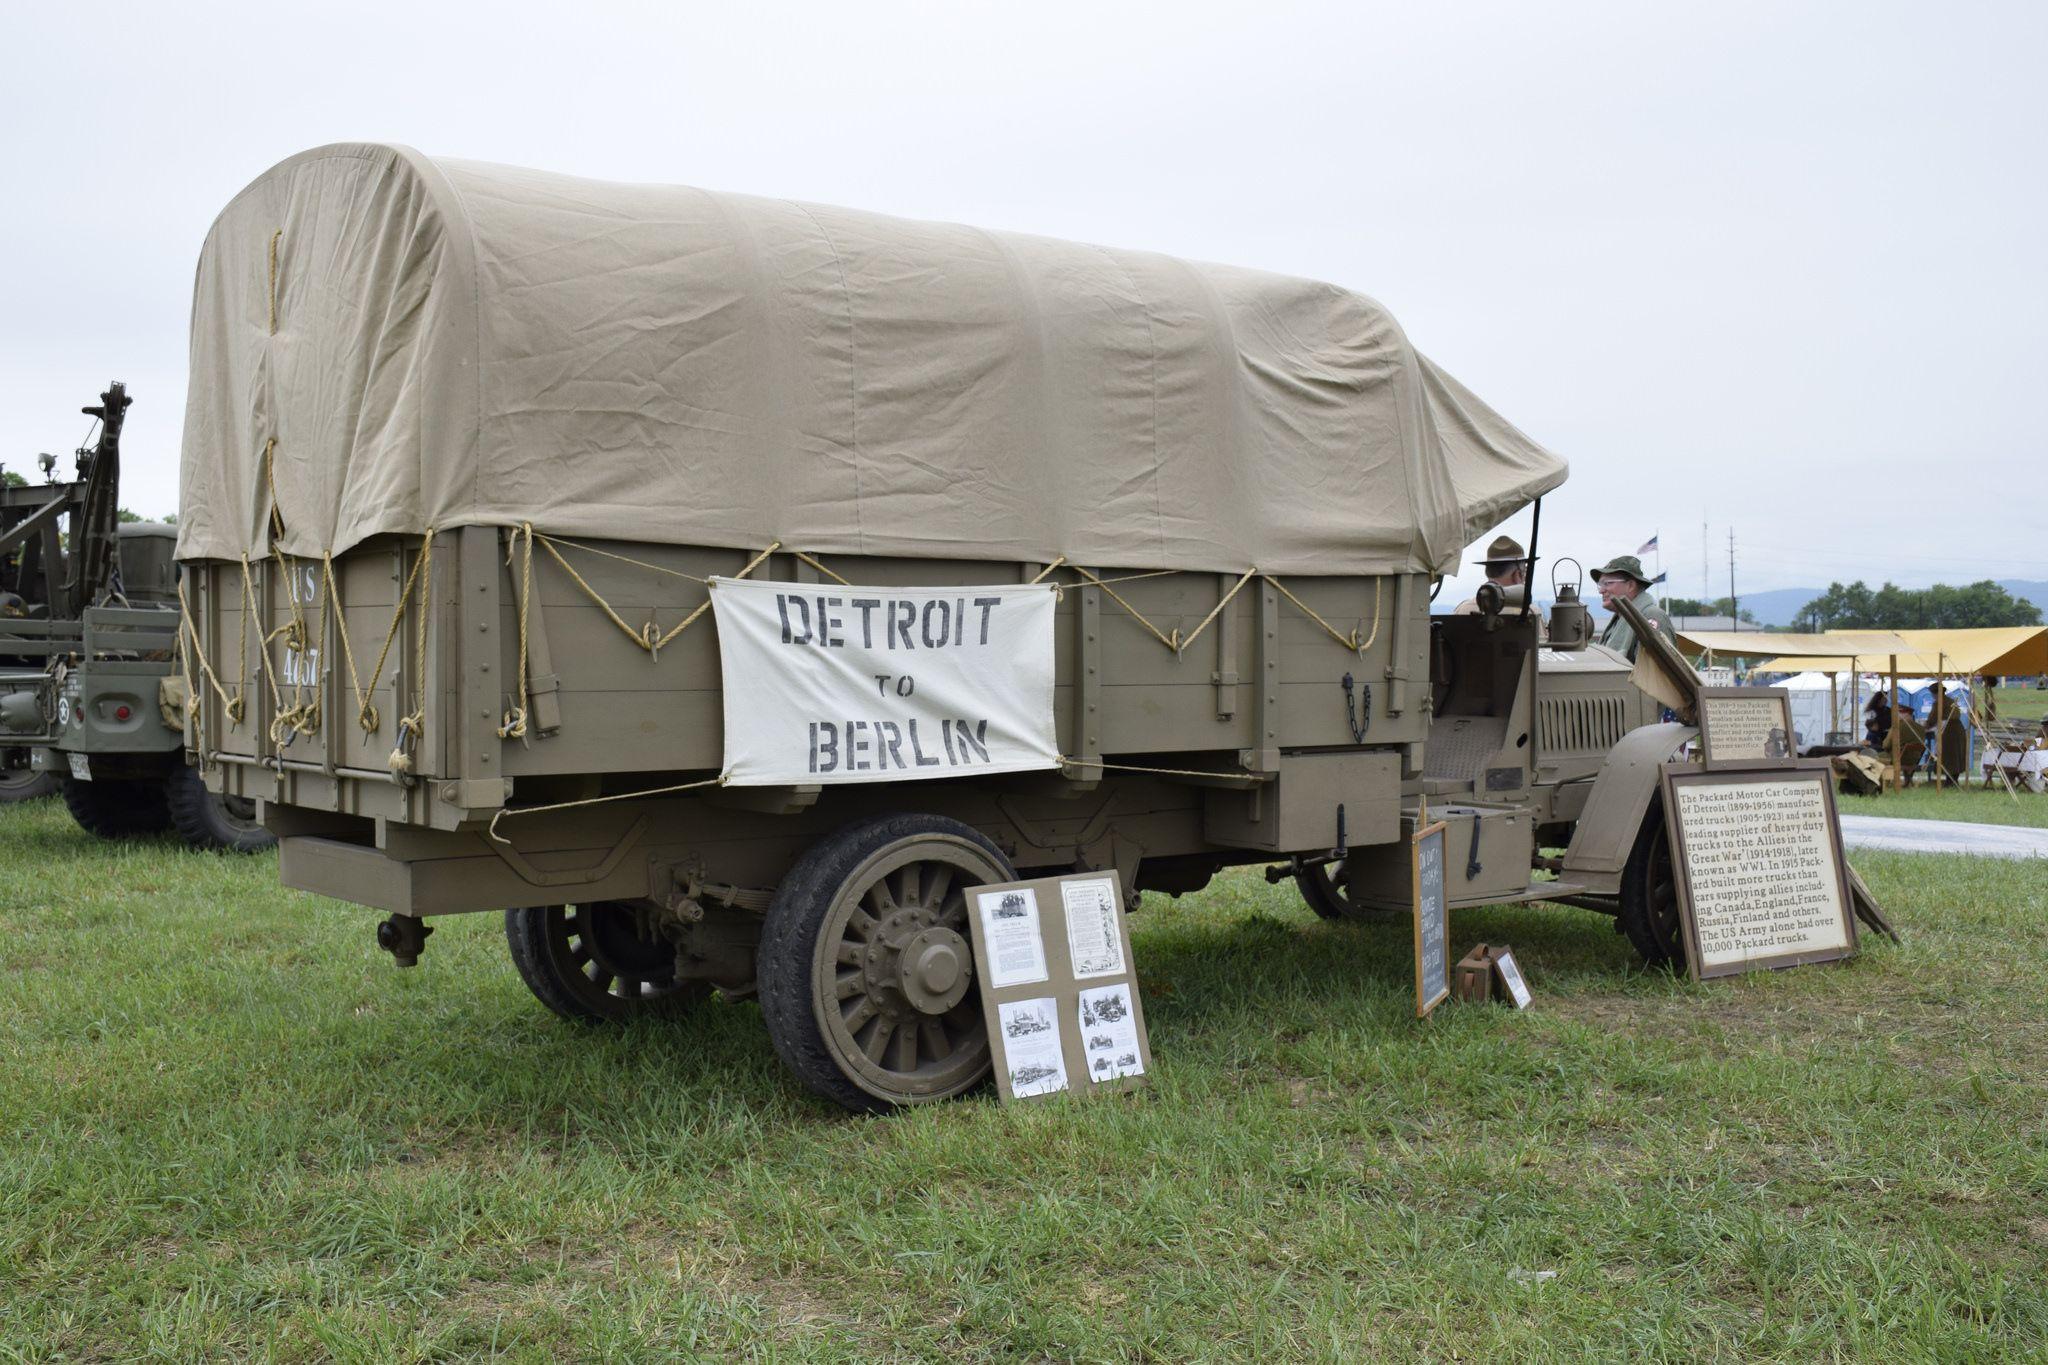 Https Flic Kr P V1l3pu Packard Army Truck